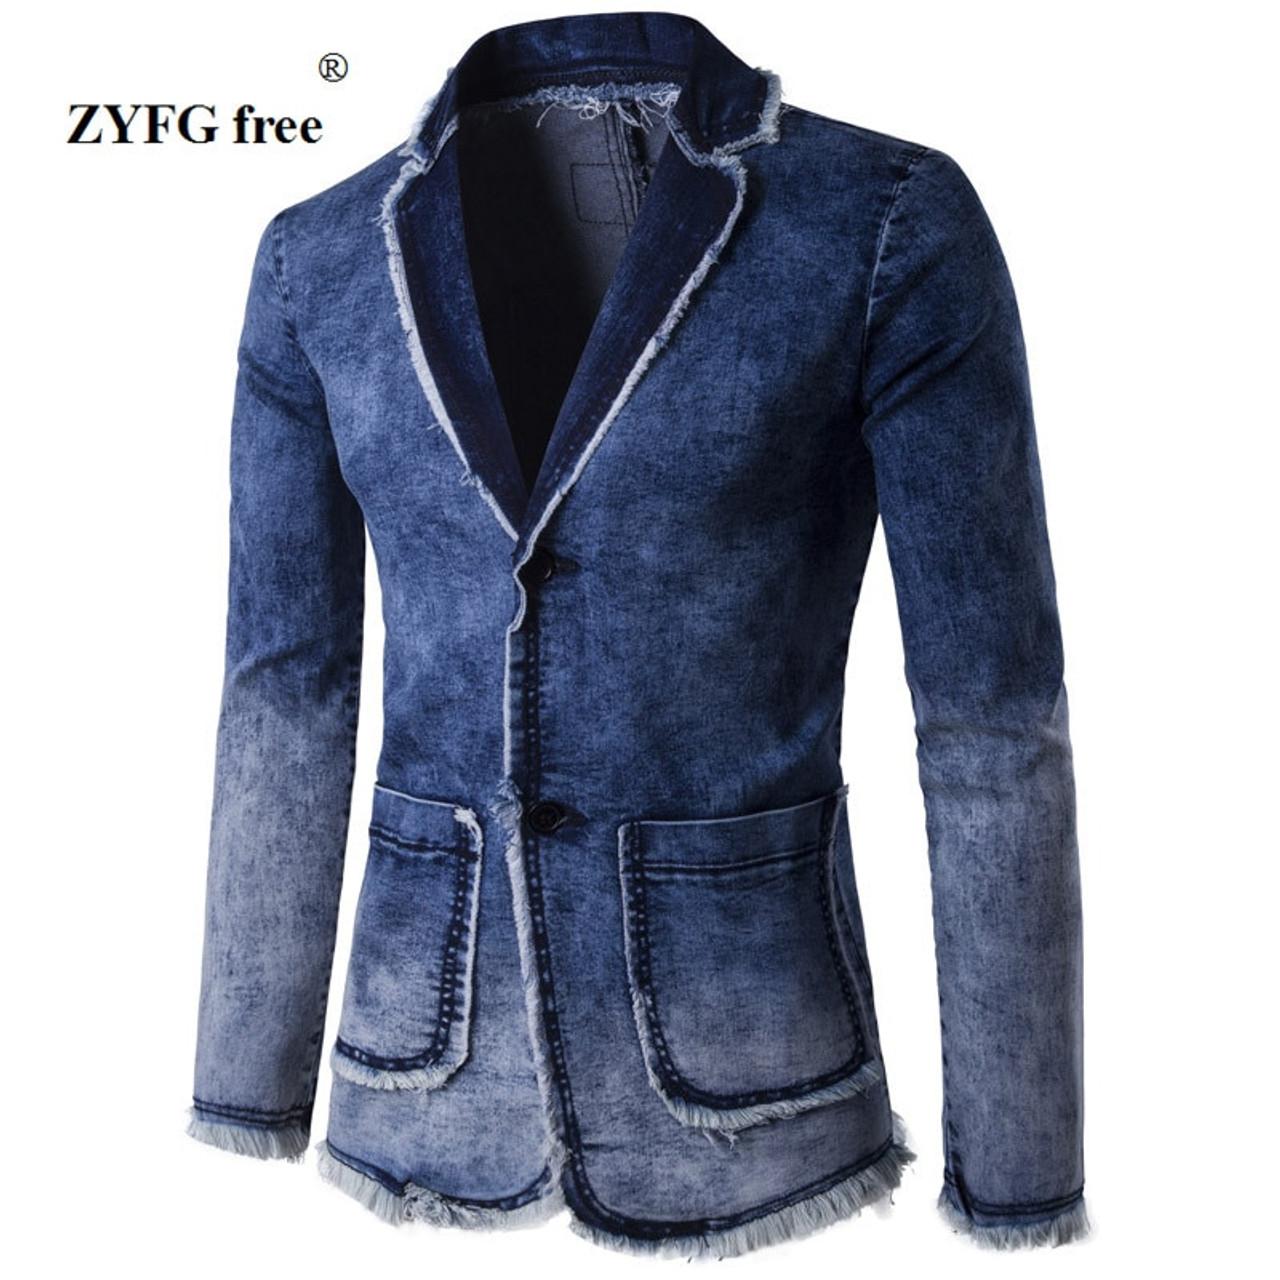 ed1c7be8037 Casual Denim Jacket Suit Men s 2018 New Spring Fashion blazer slim fit  masculino Trend Jeans suit ...